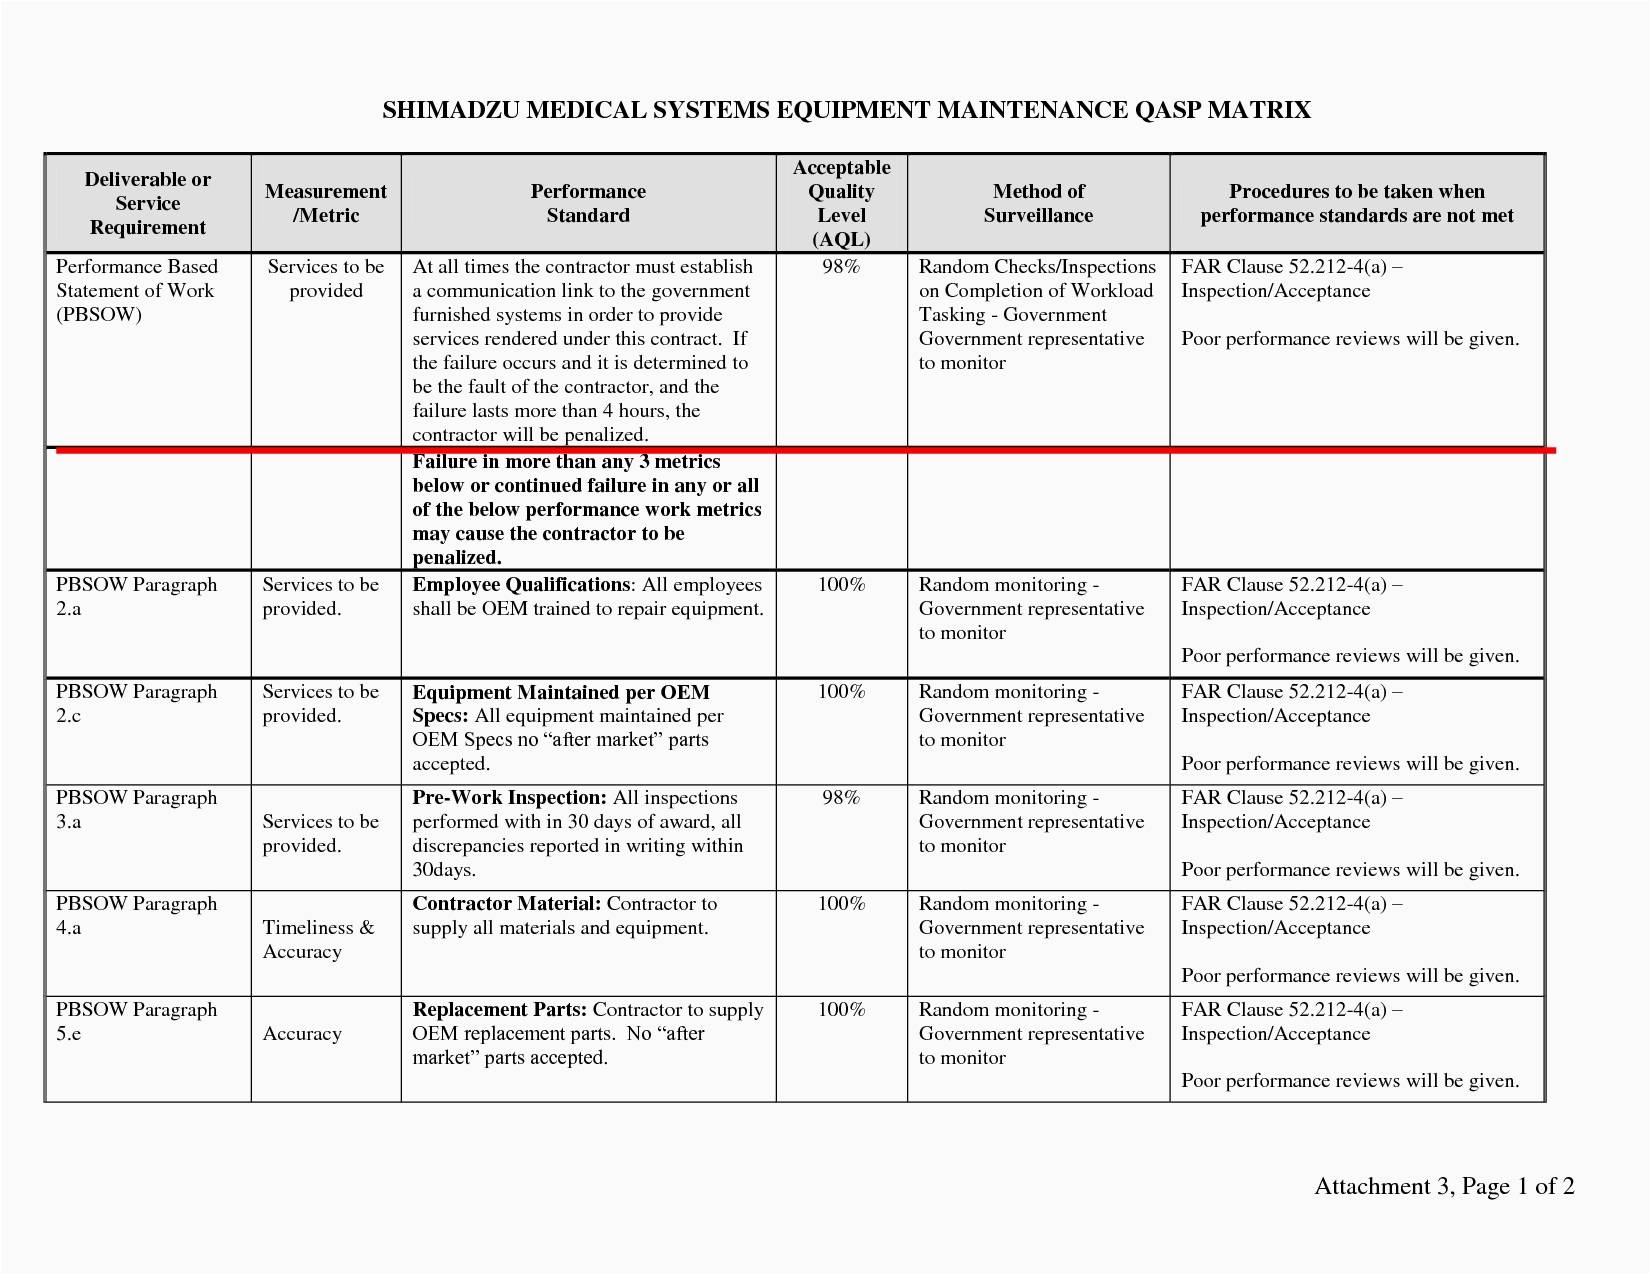 food control plan 2018 pdf